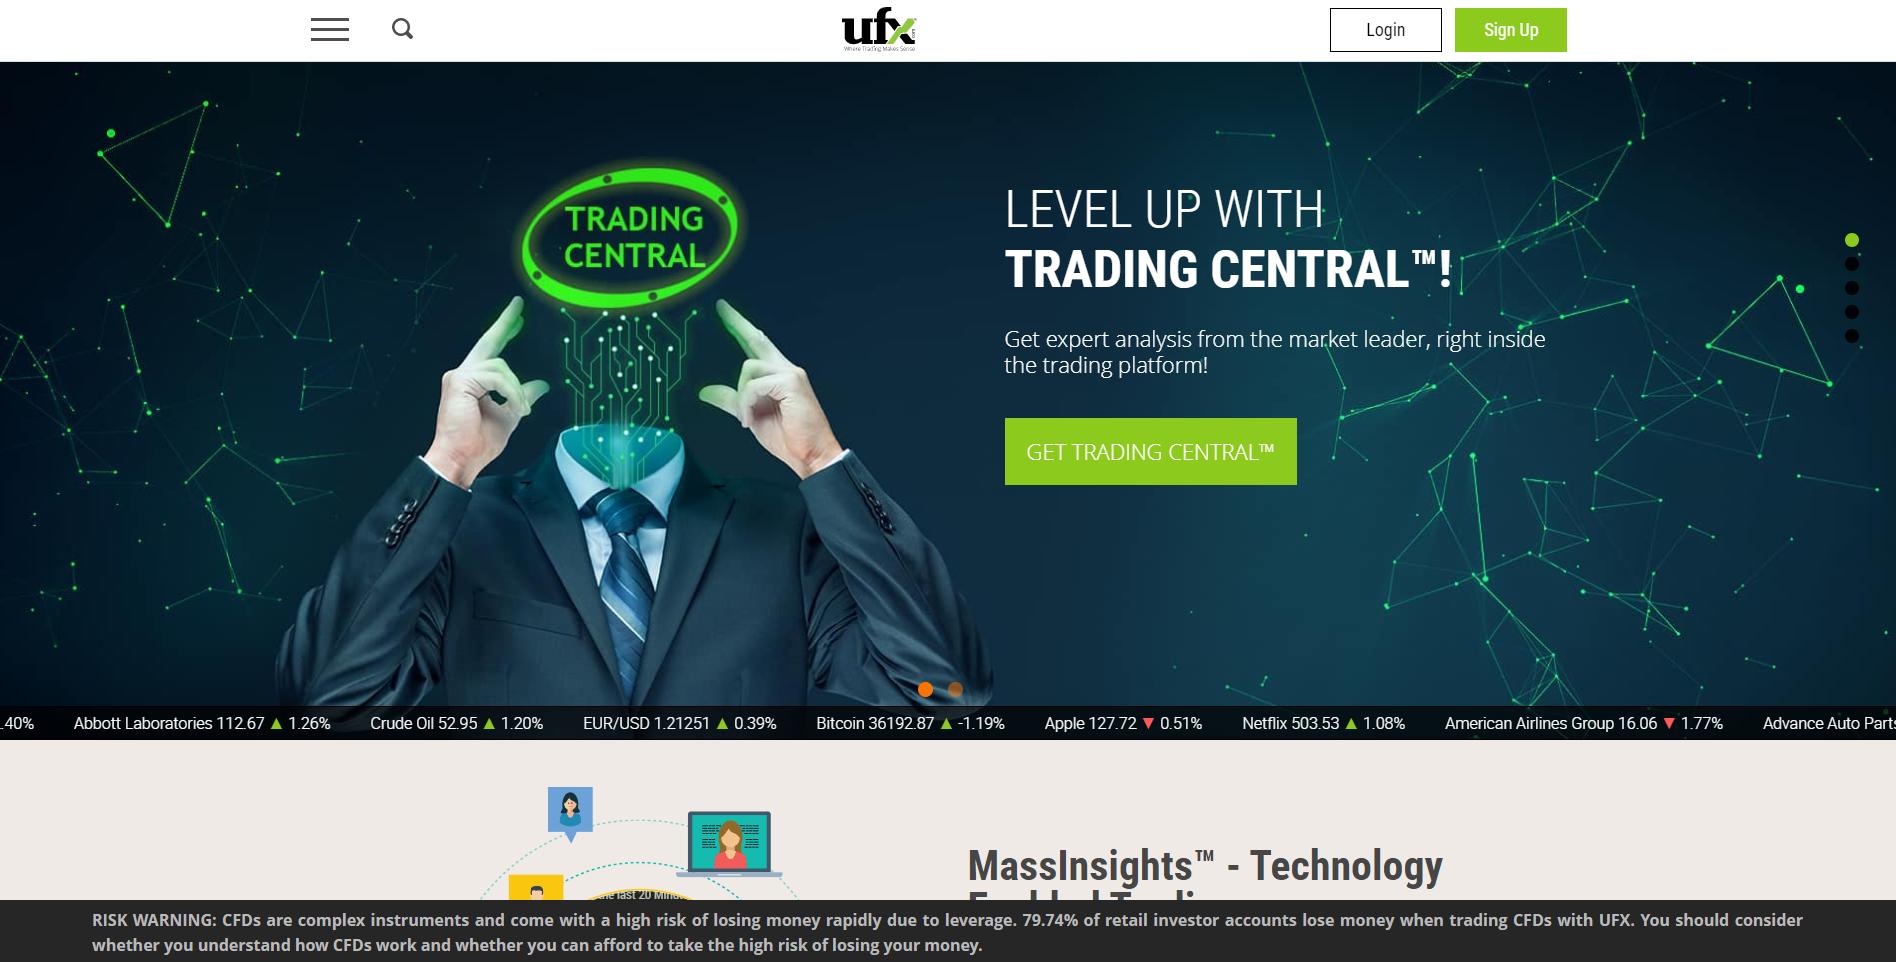 Official website of the broker UFX